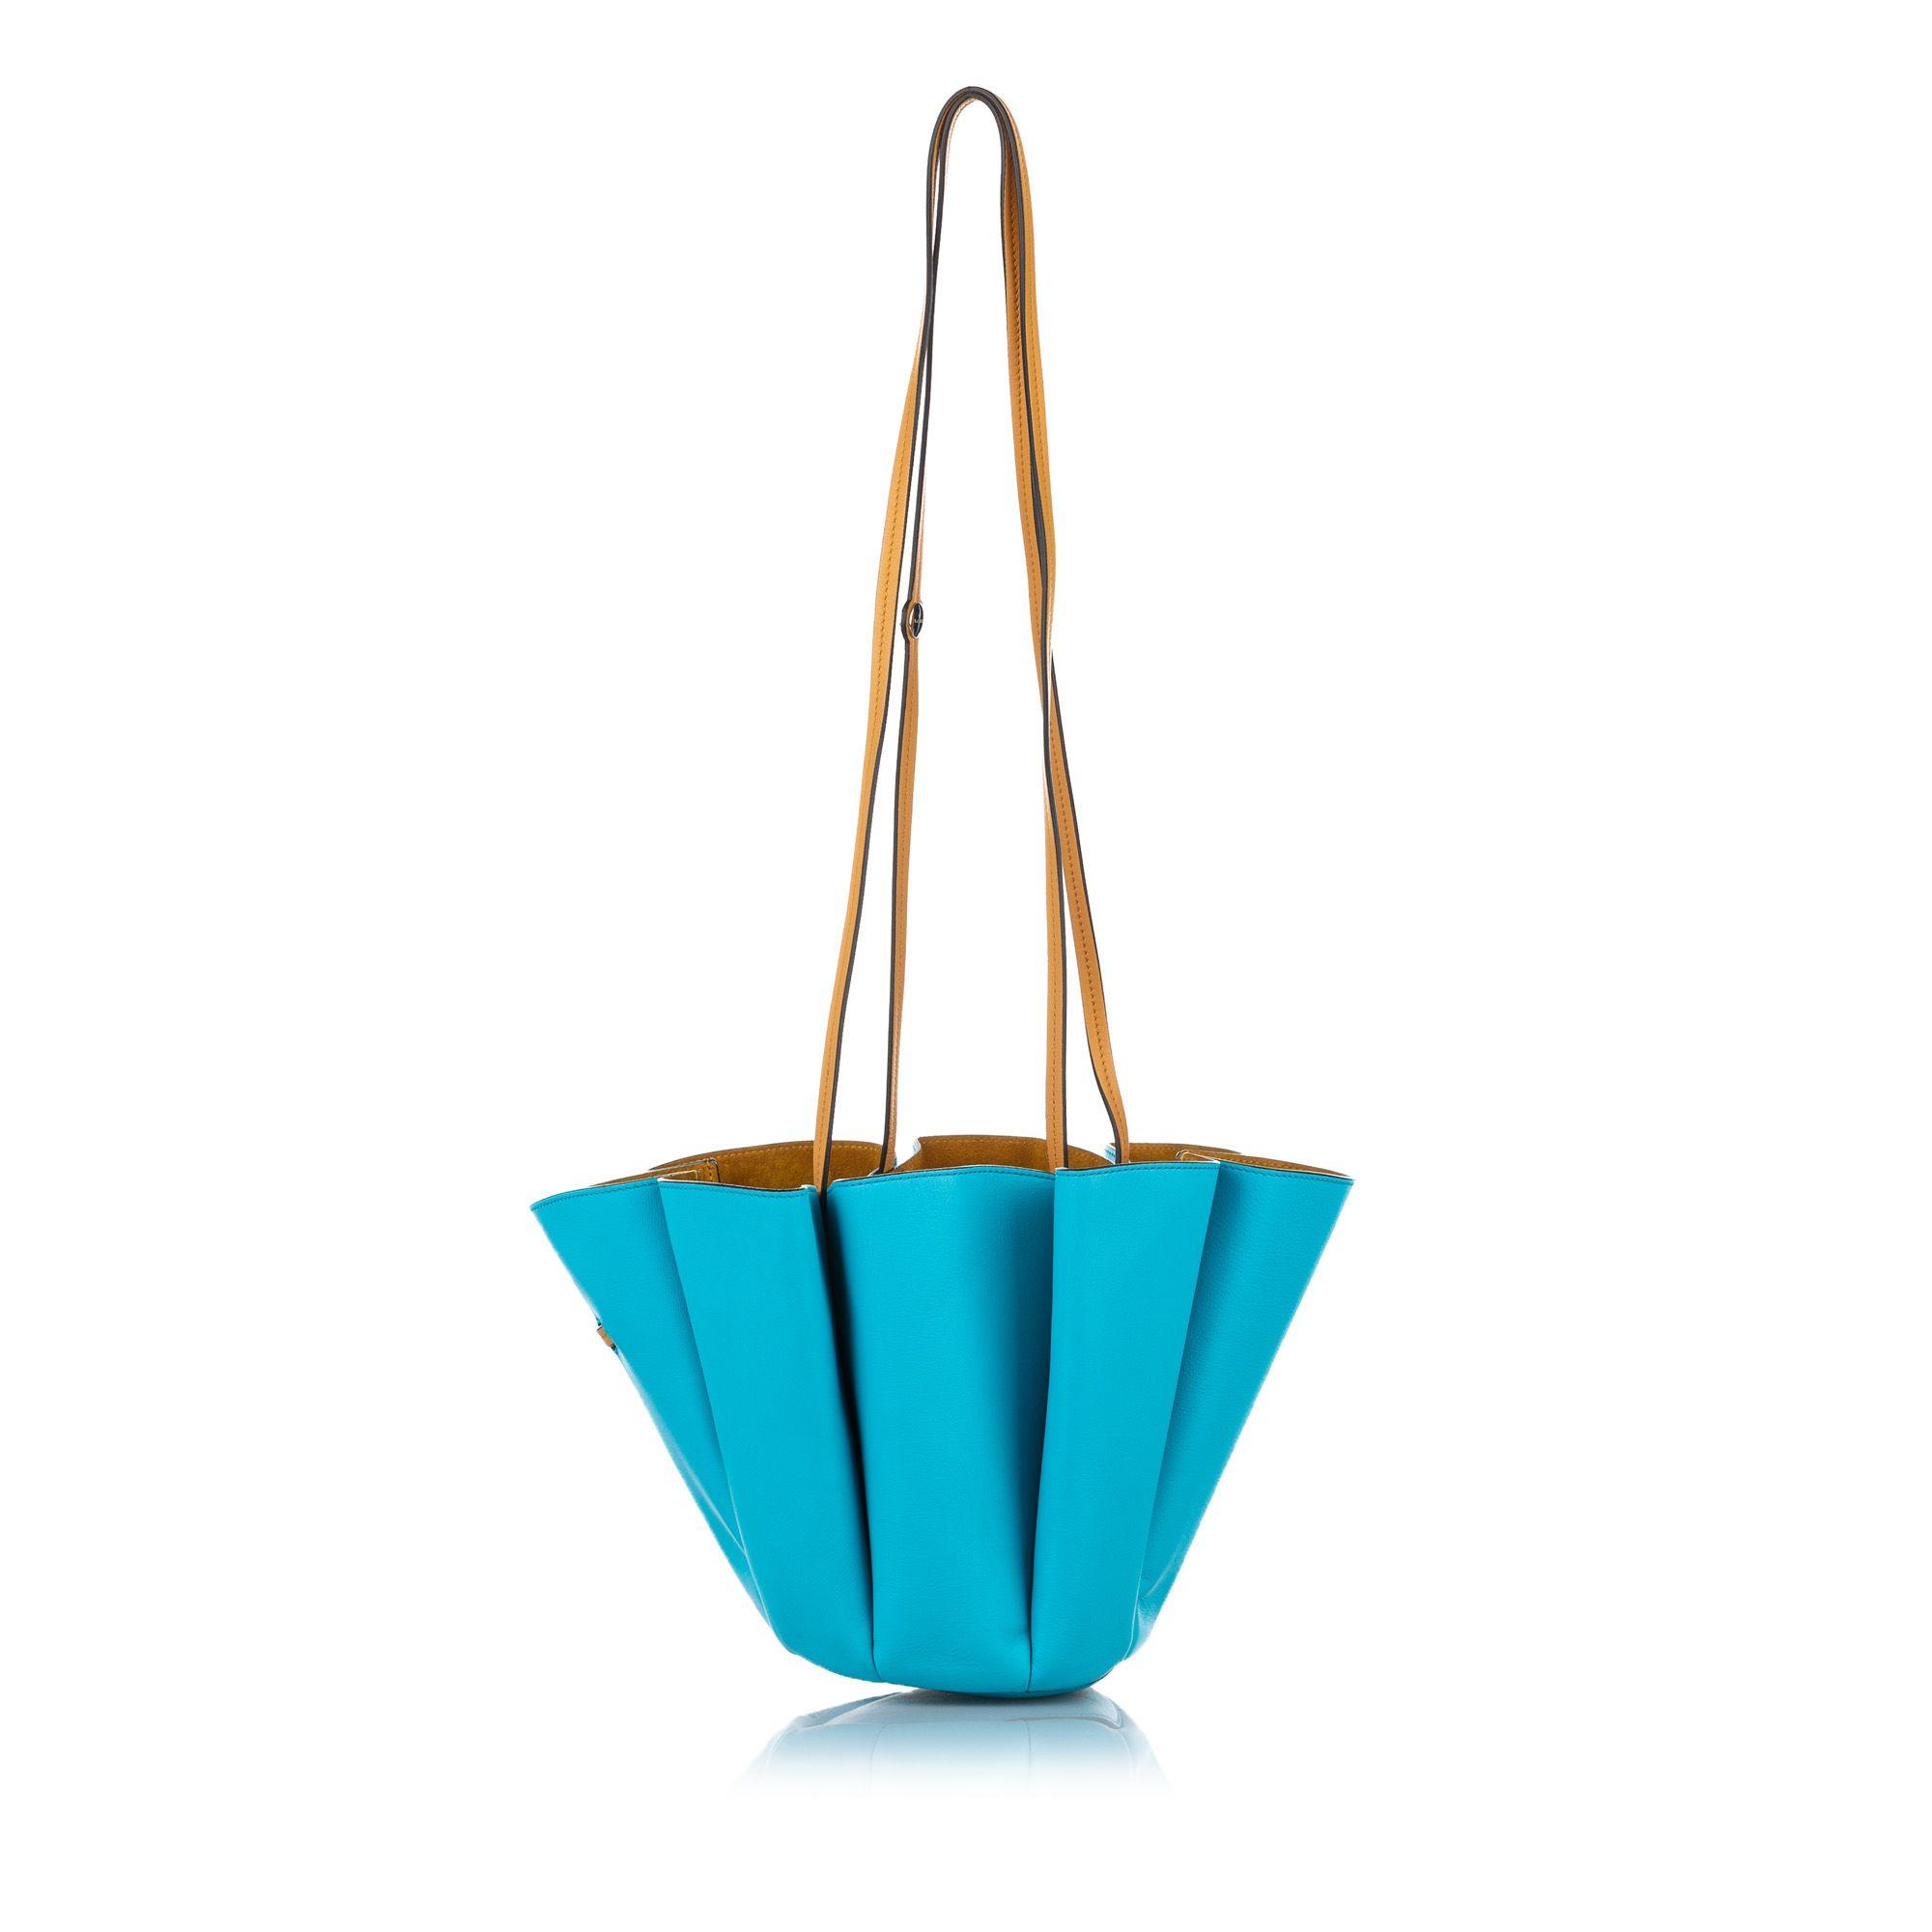 Vintage Lanvin Margeurite Bicolor Leather Bucket Bag Blue